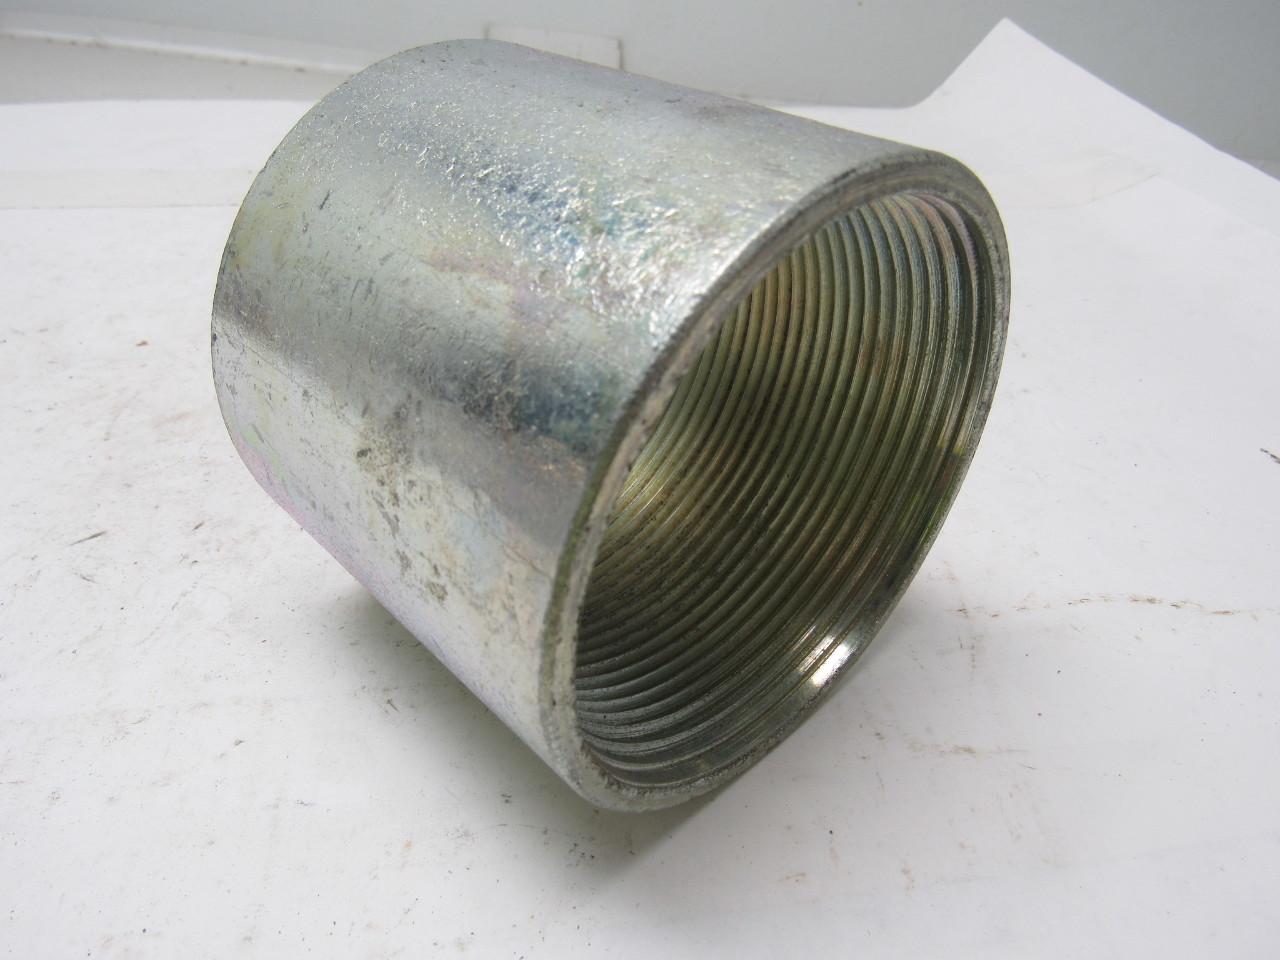 Quot npt threaded one piece rigid steel conduit coupling